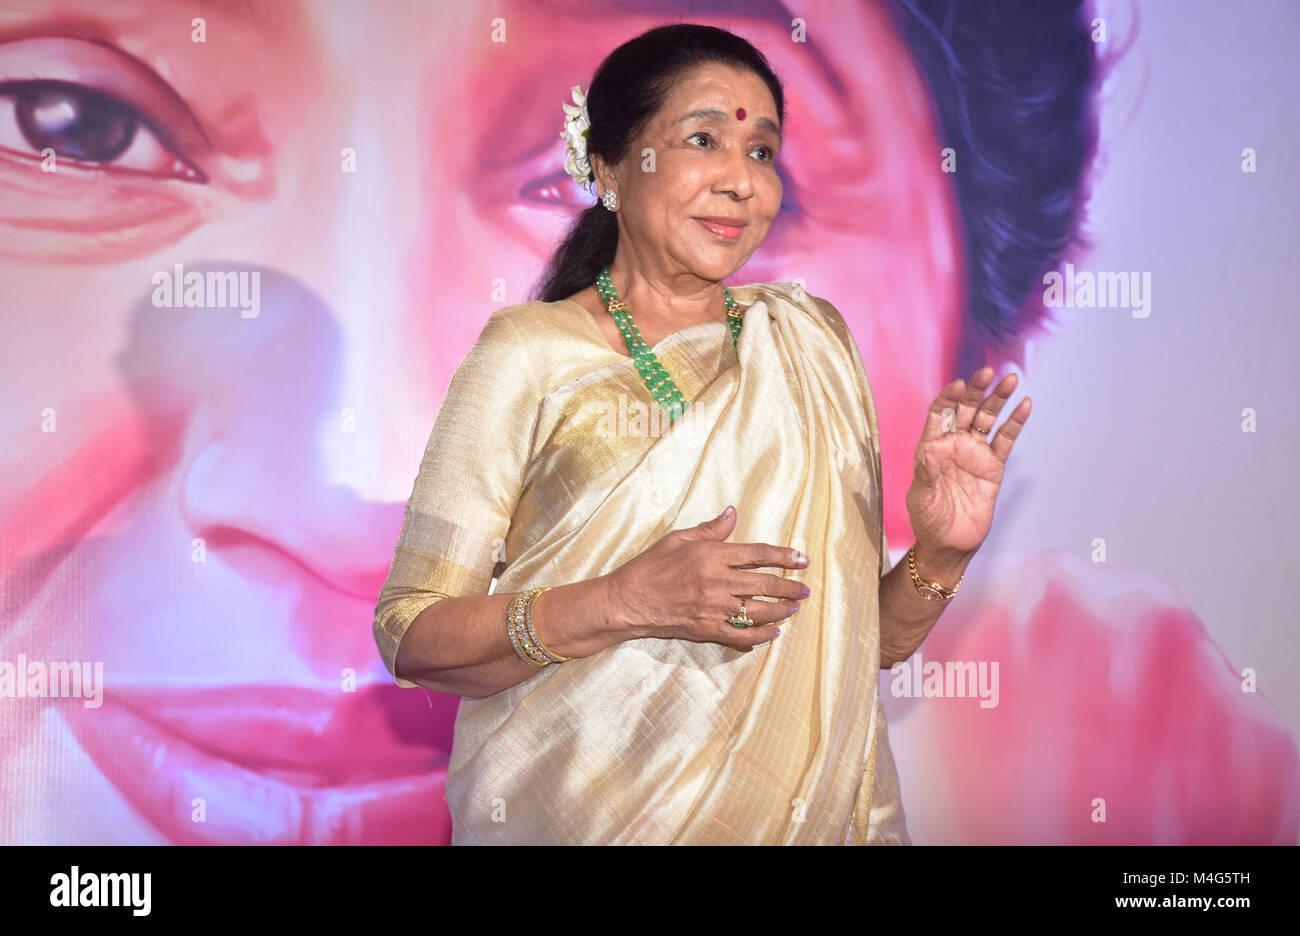 Indian Playback Singer Asha Bhosle Present At The 5th Yash Chopra Memorial Award At Hotel Jw Marriott Juhu In Mumbai Credit Azhar Khan Sopa Zuma